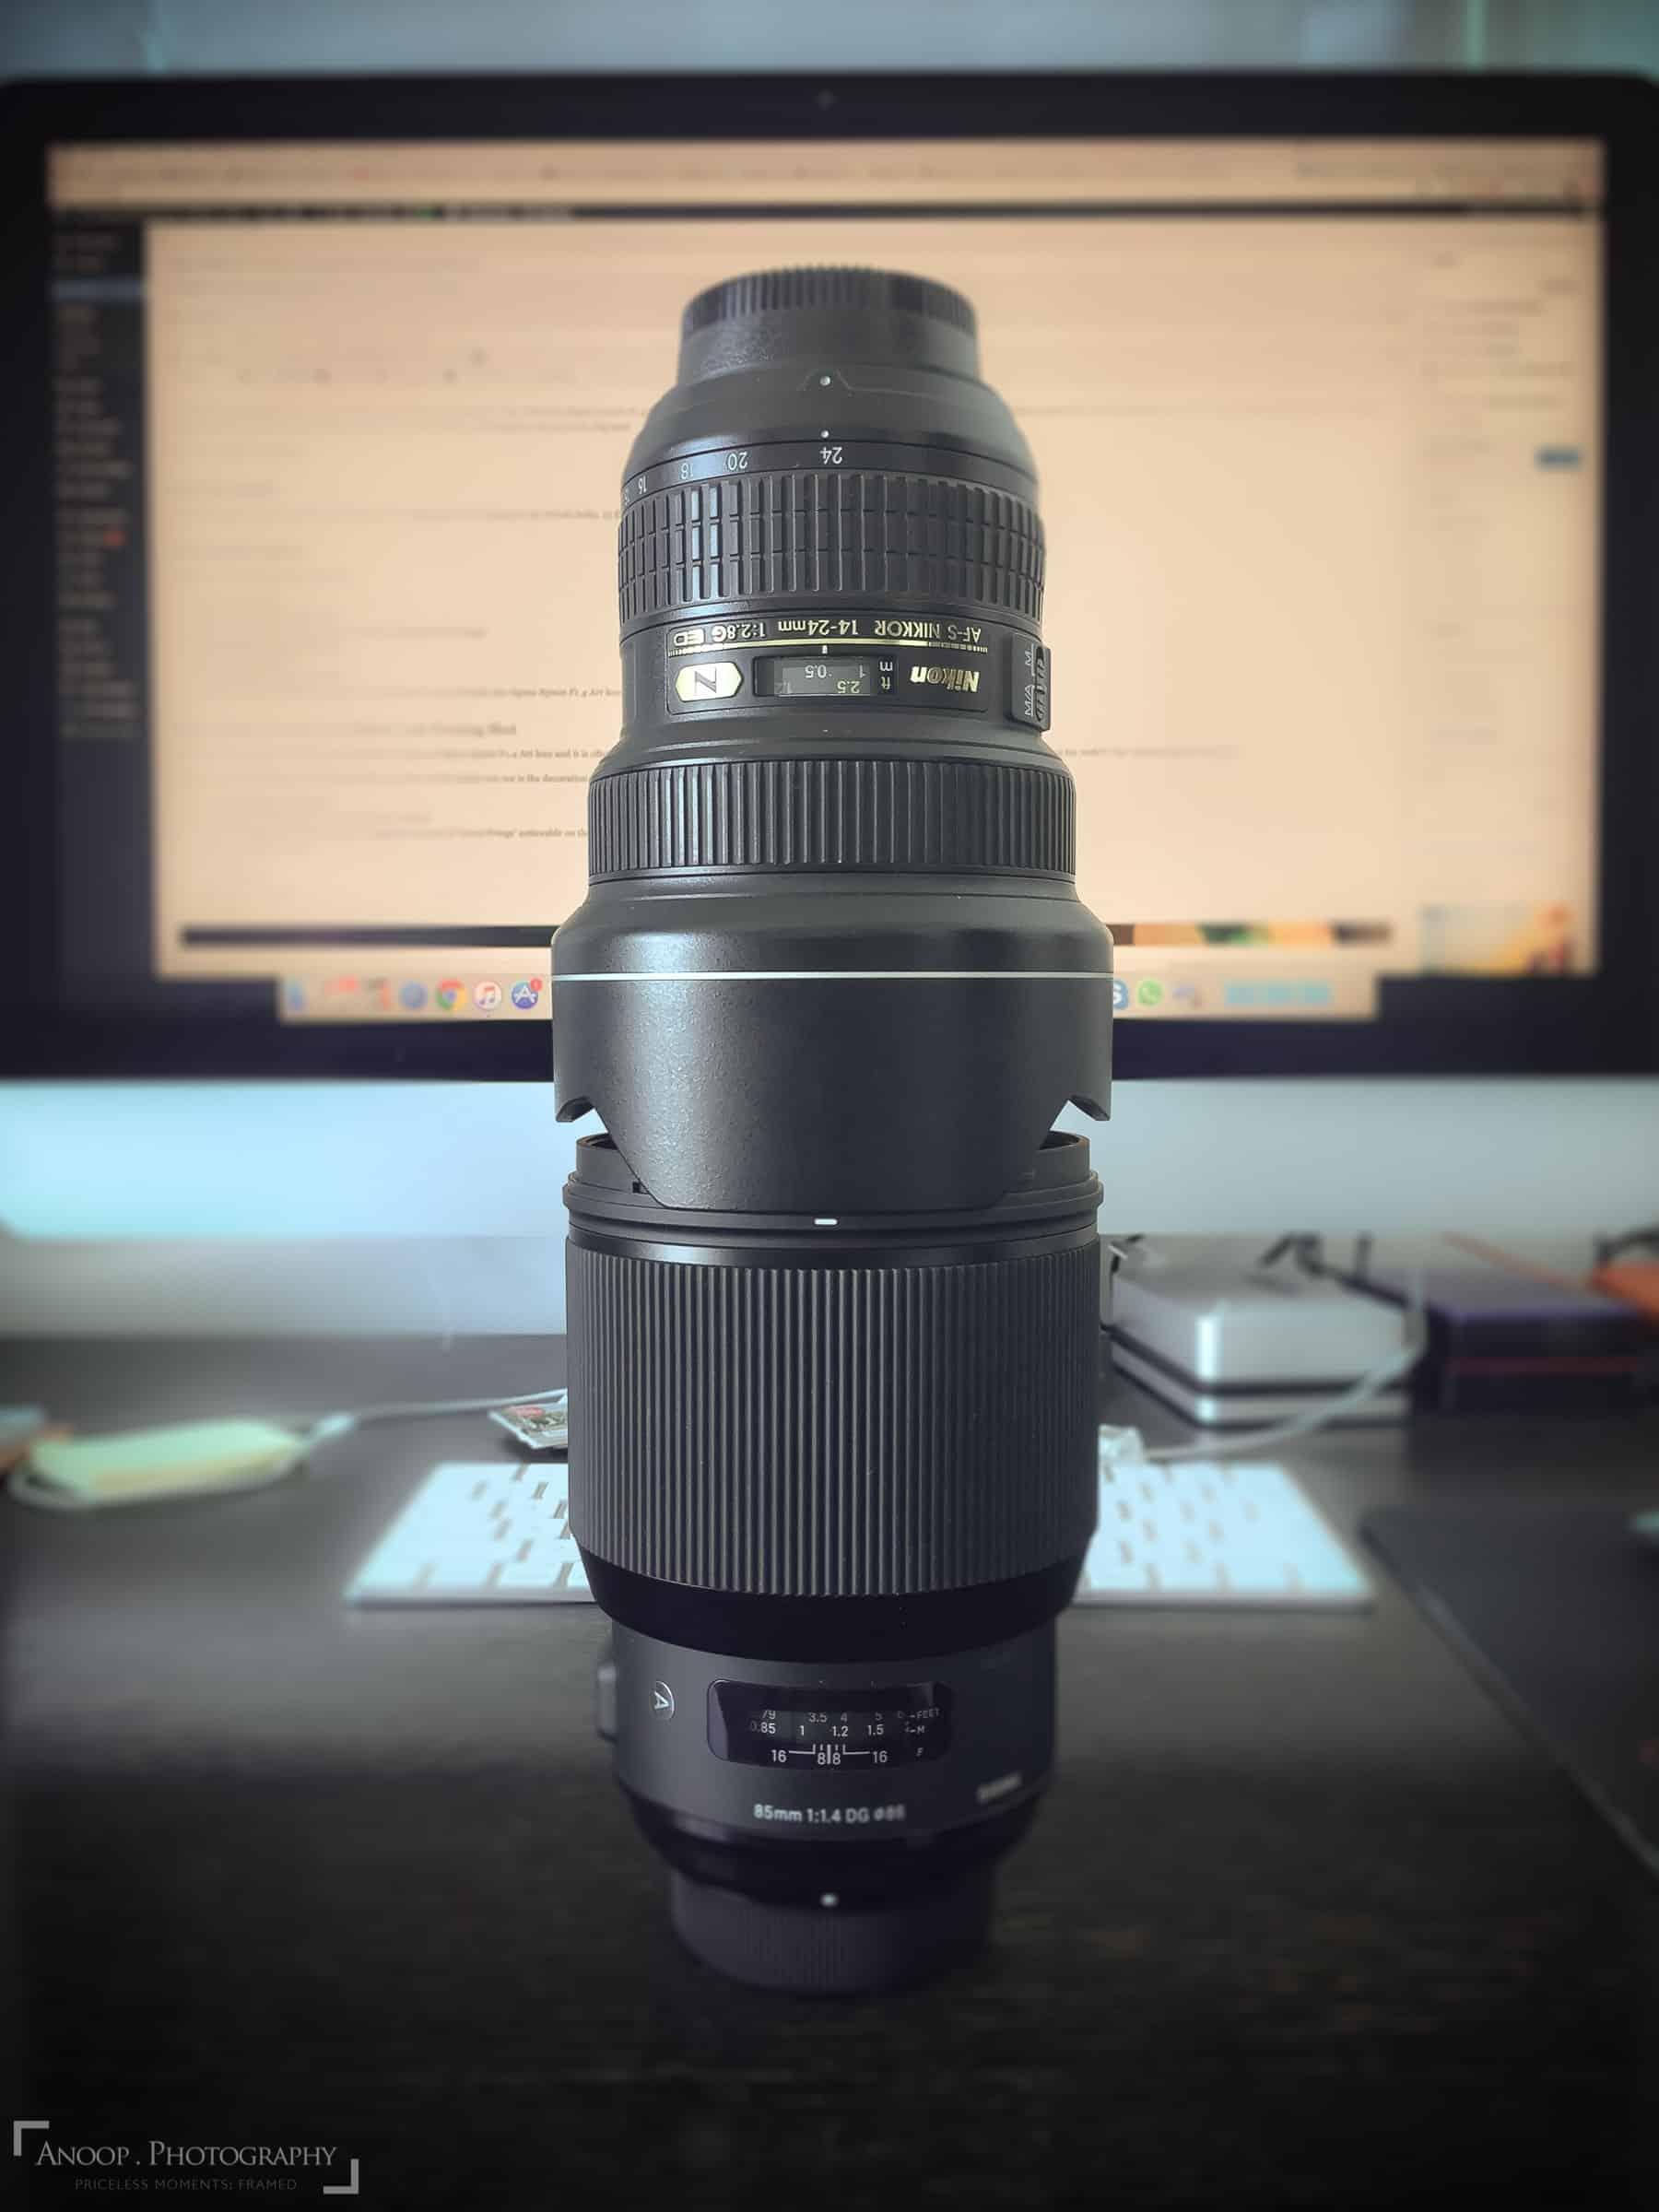 sigma-85mm-f1-4-art-compared-to-nikon-14-24mm-f2-8